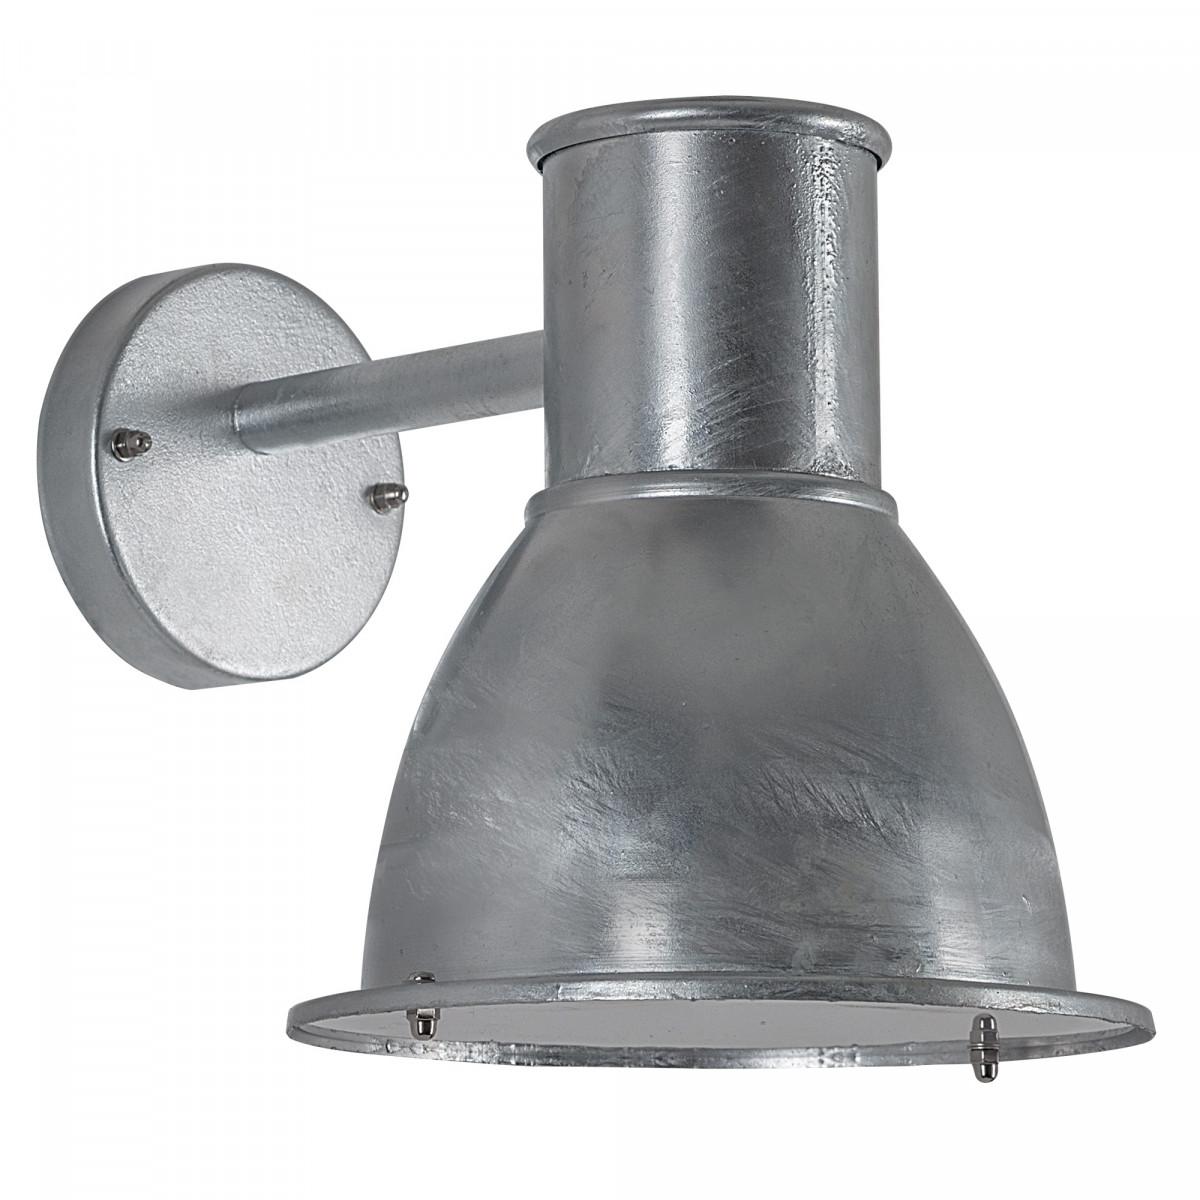 Buitenlamp Barn verzinkt